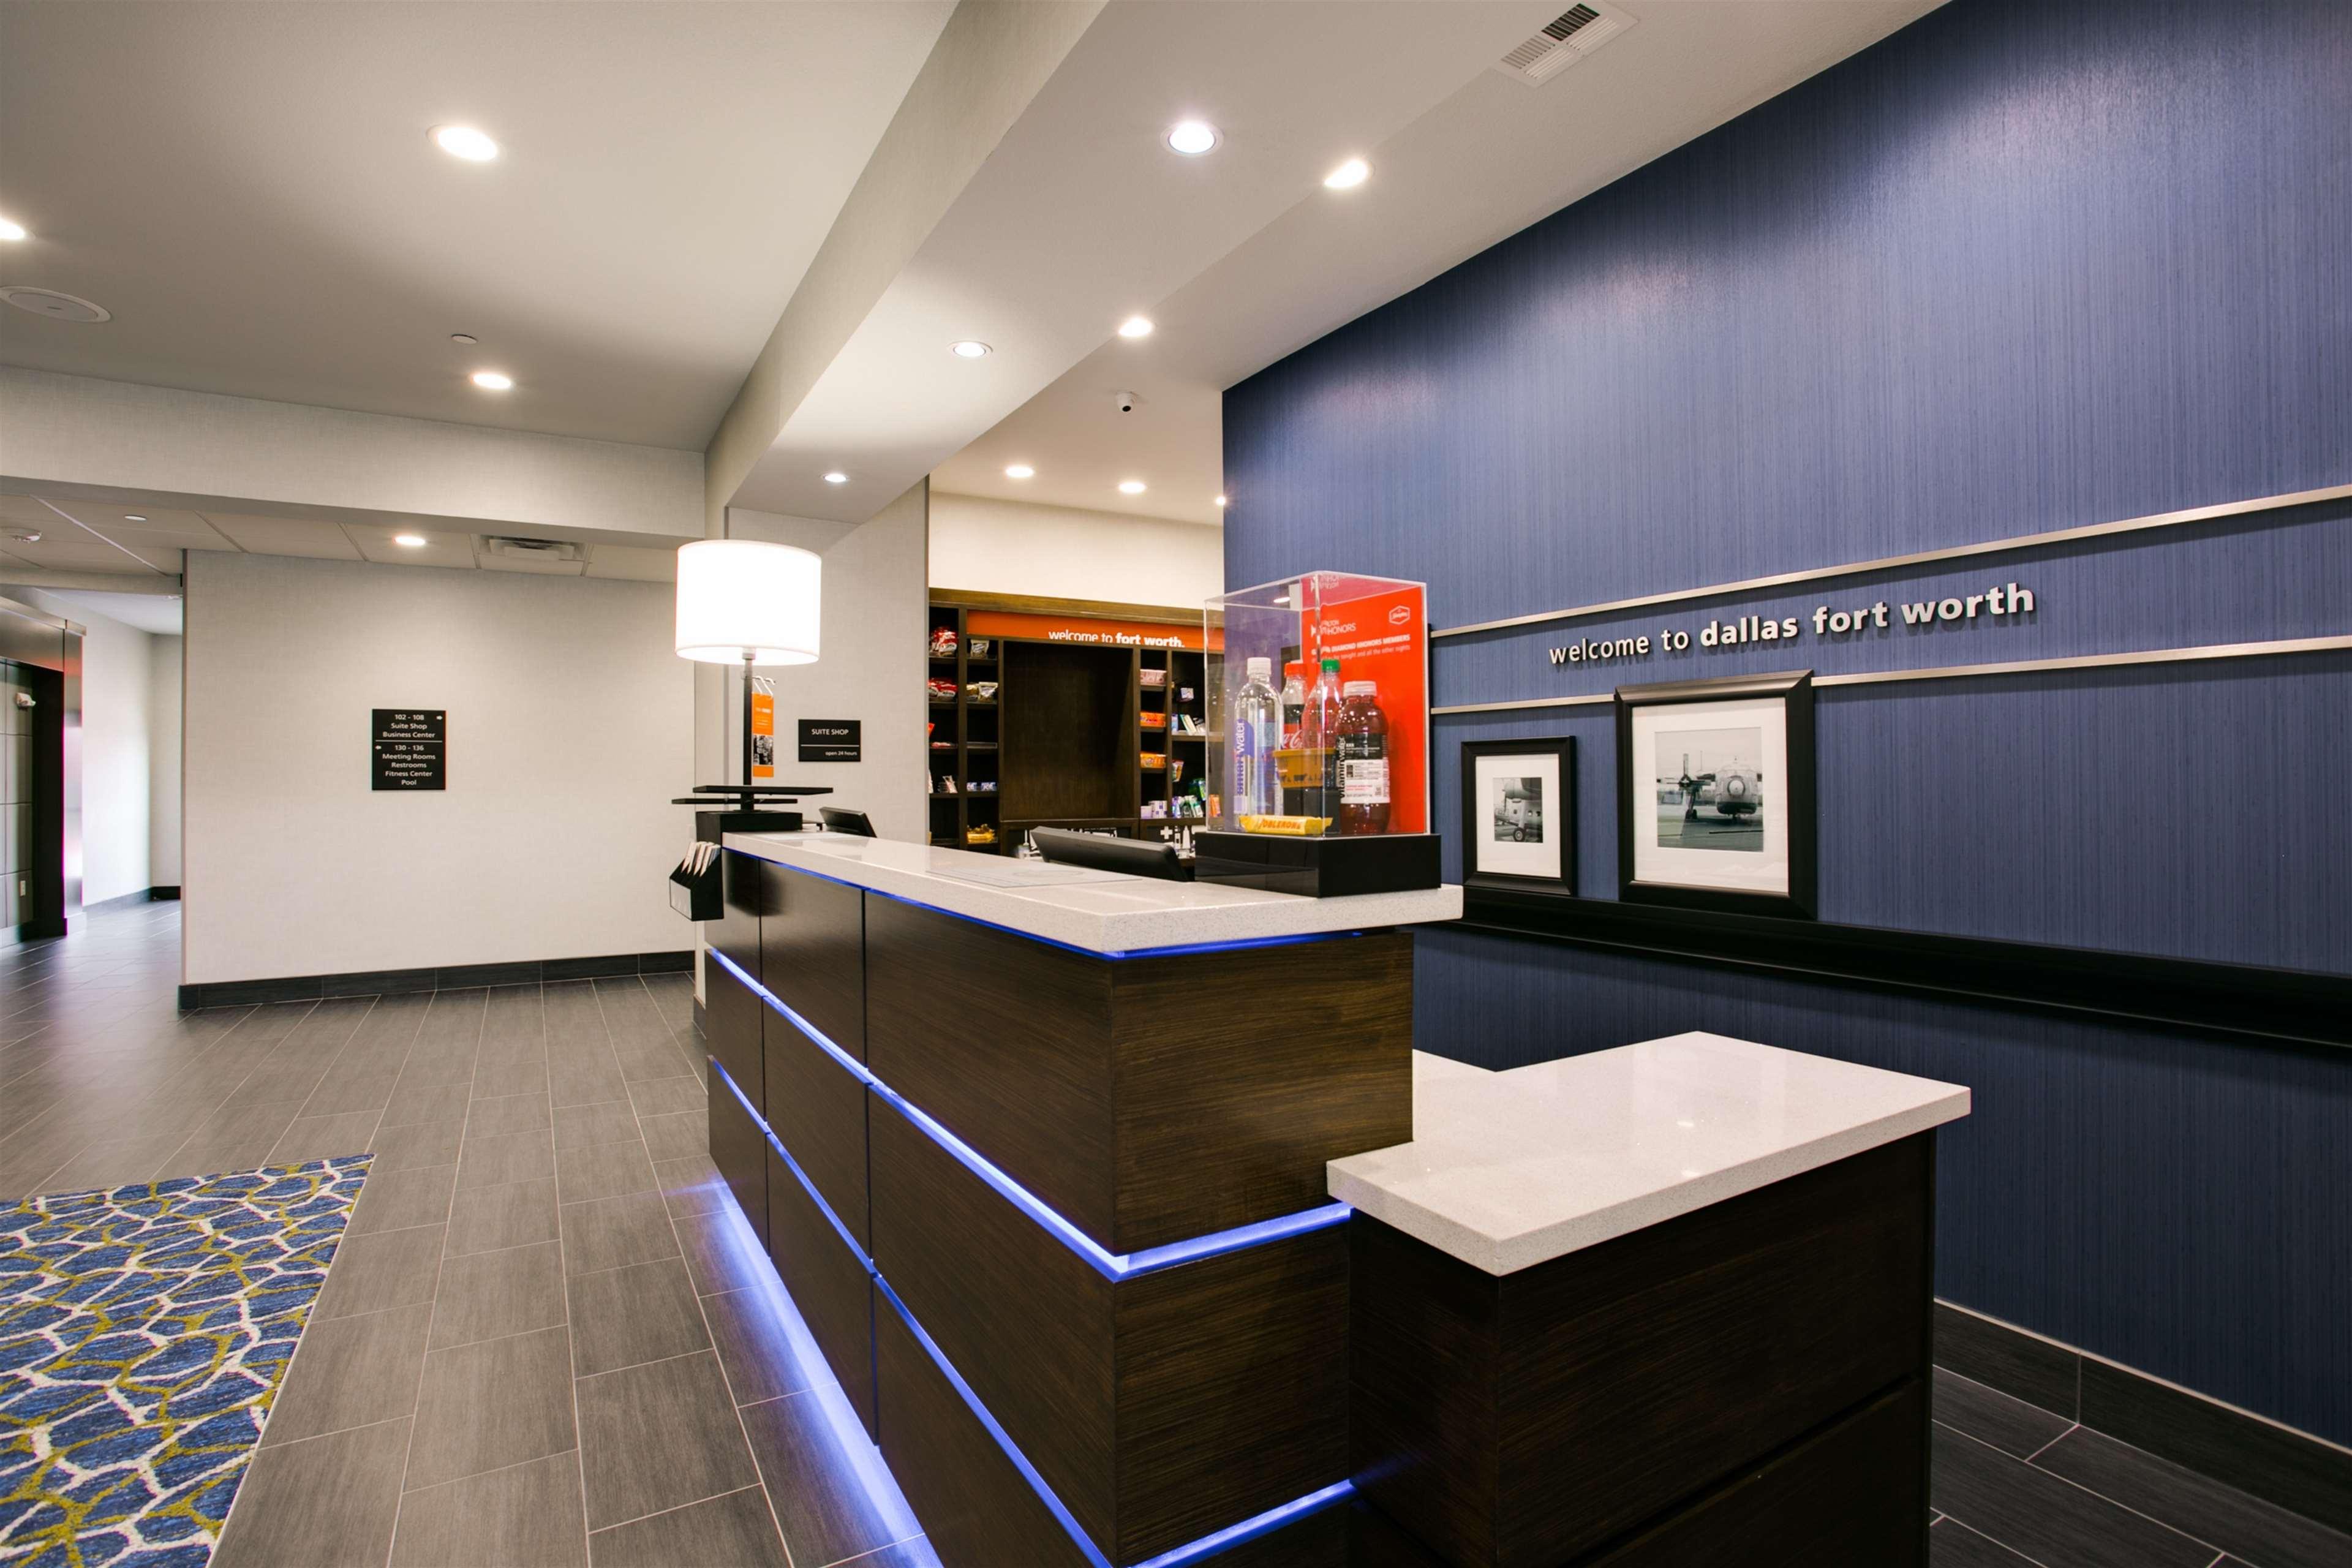 Hampton Inn & Suites Dallas/Ft. Worth Airport South image 5